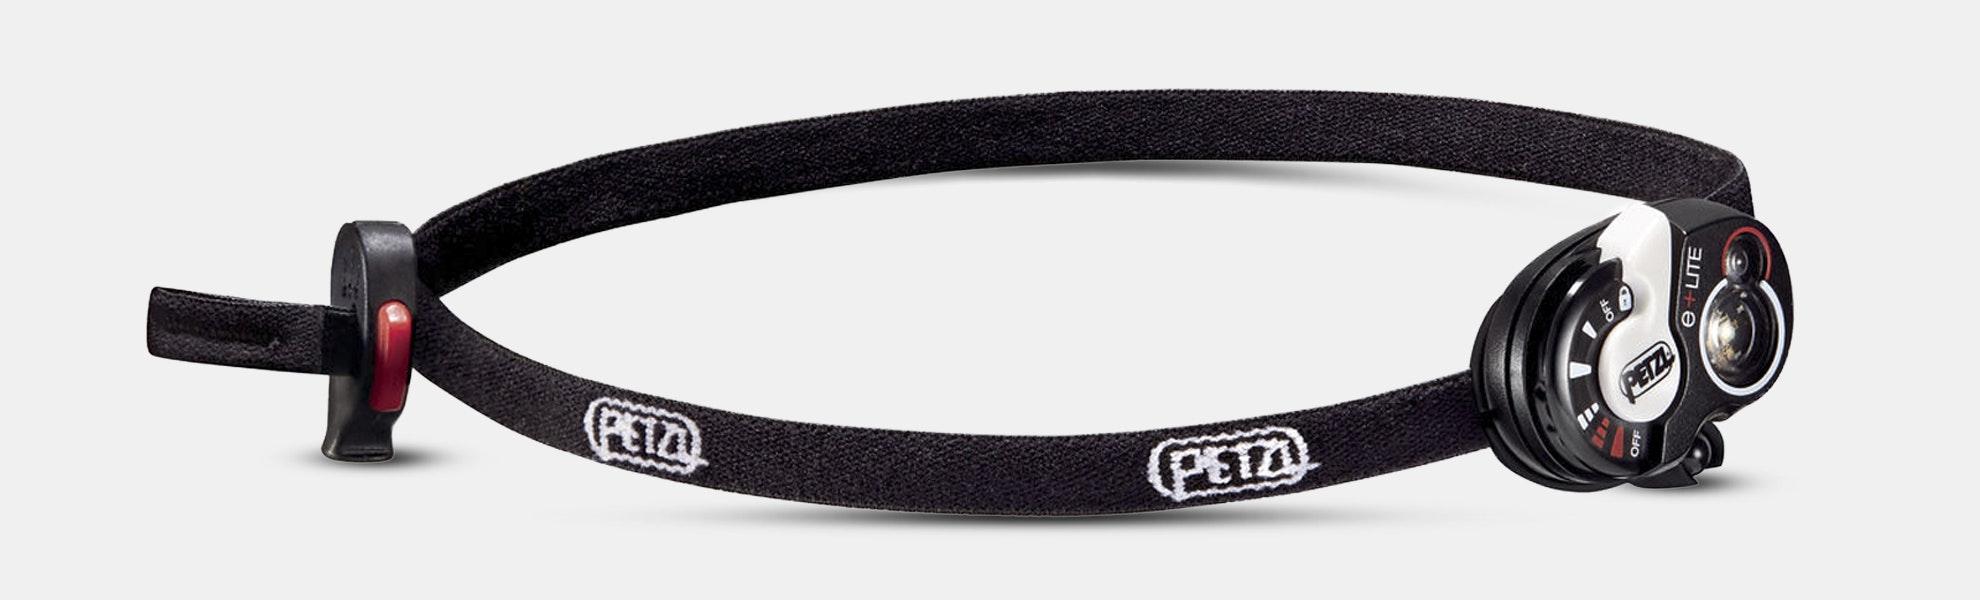 Petzl e+Lite 50-Lumen Headlamp